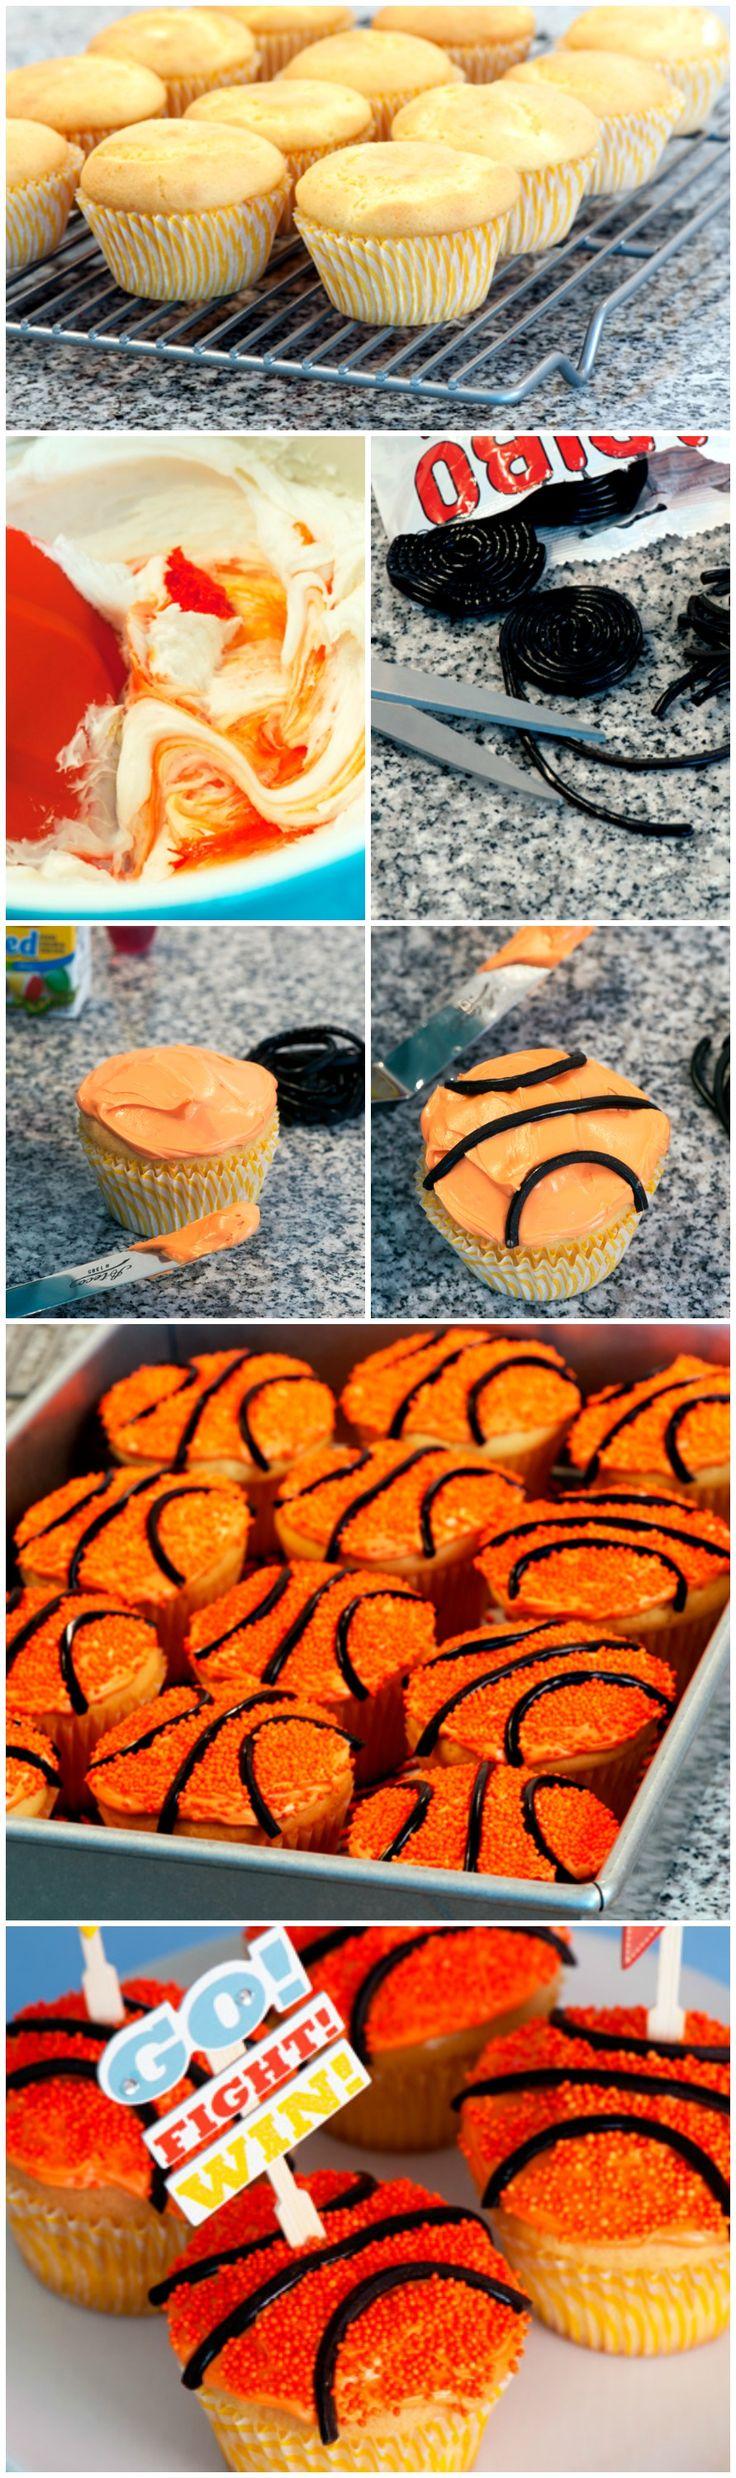 #Basketball Cupcakes